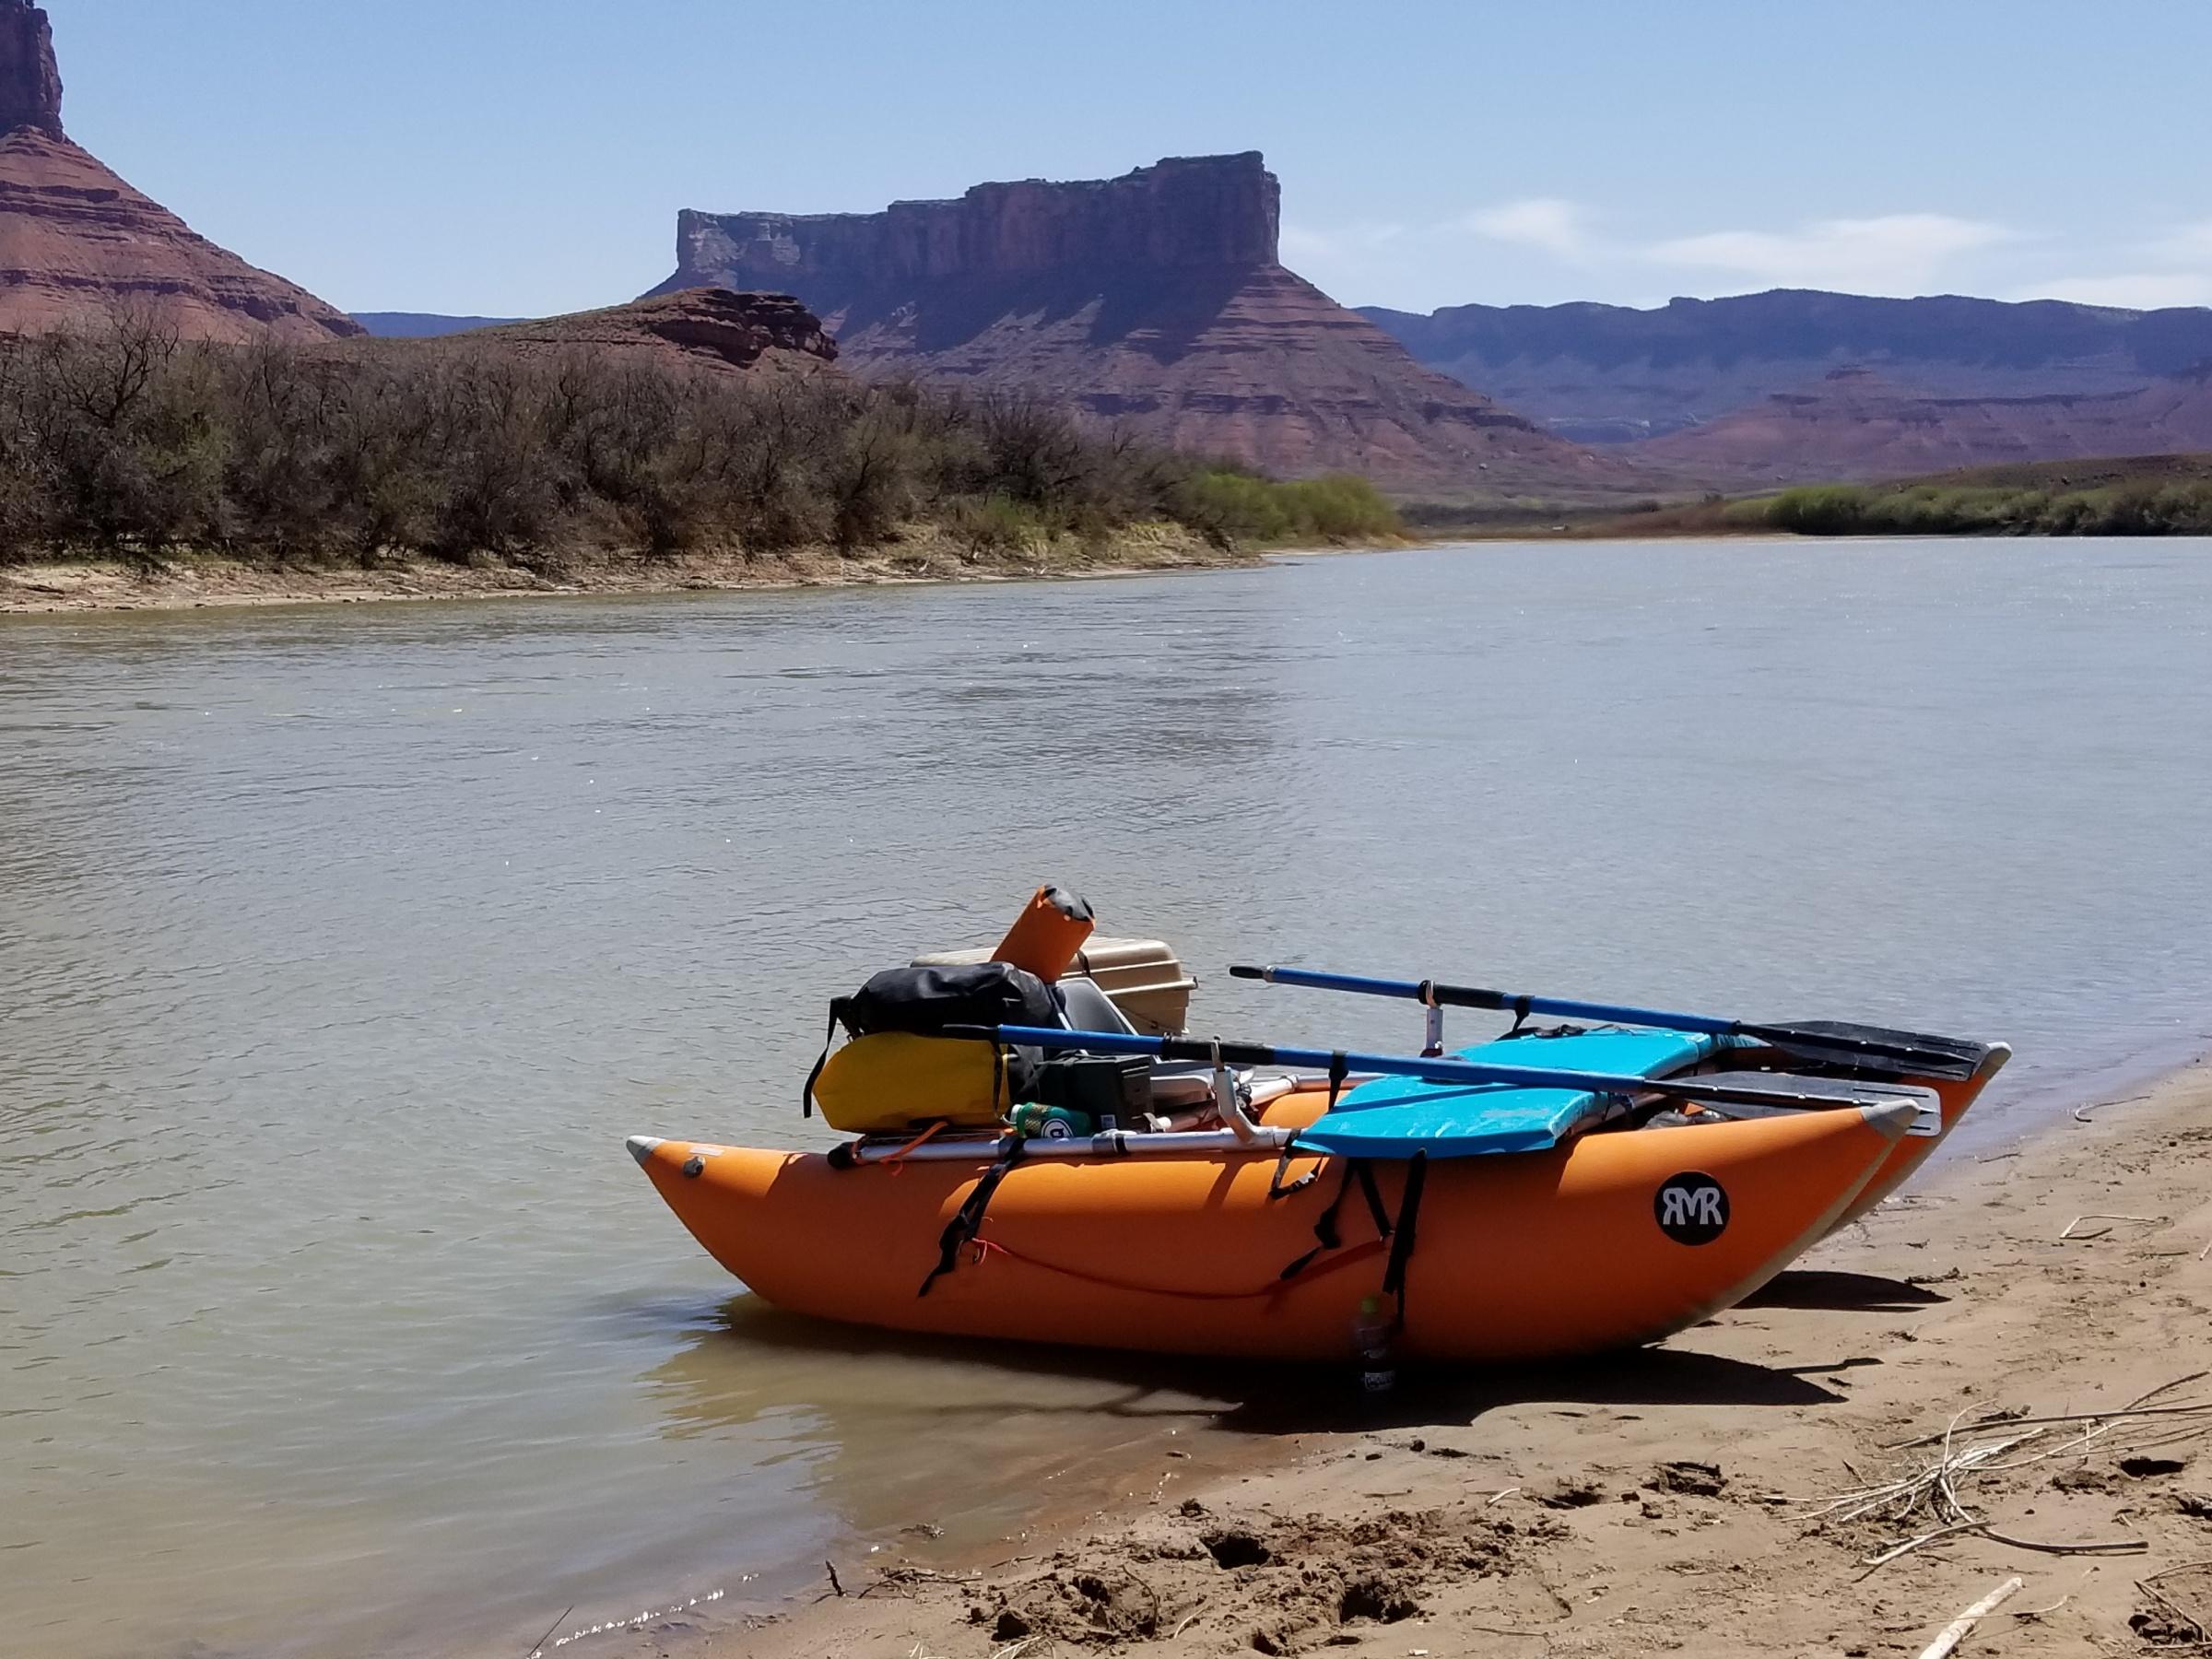 RMR Phat Cat as a gear boat? - Mountain Buzz